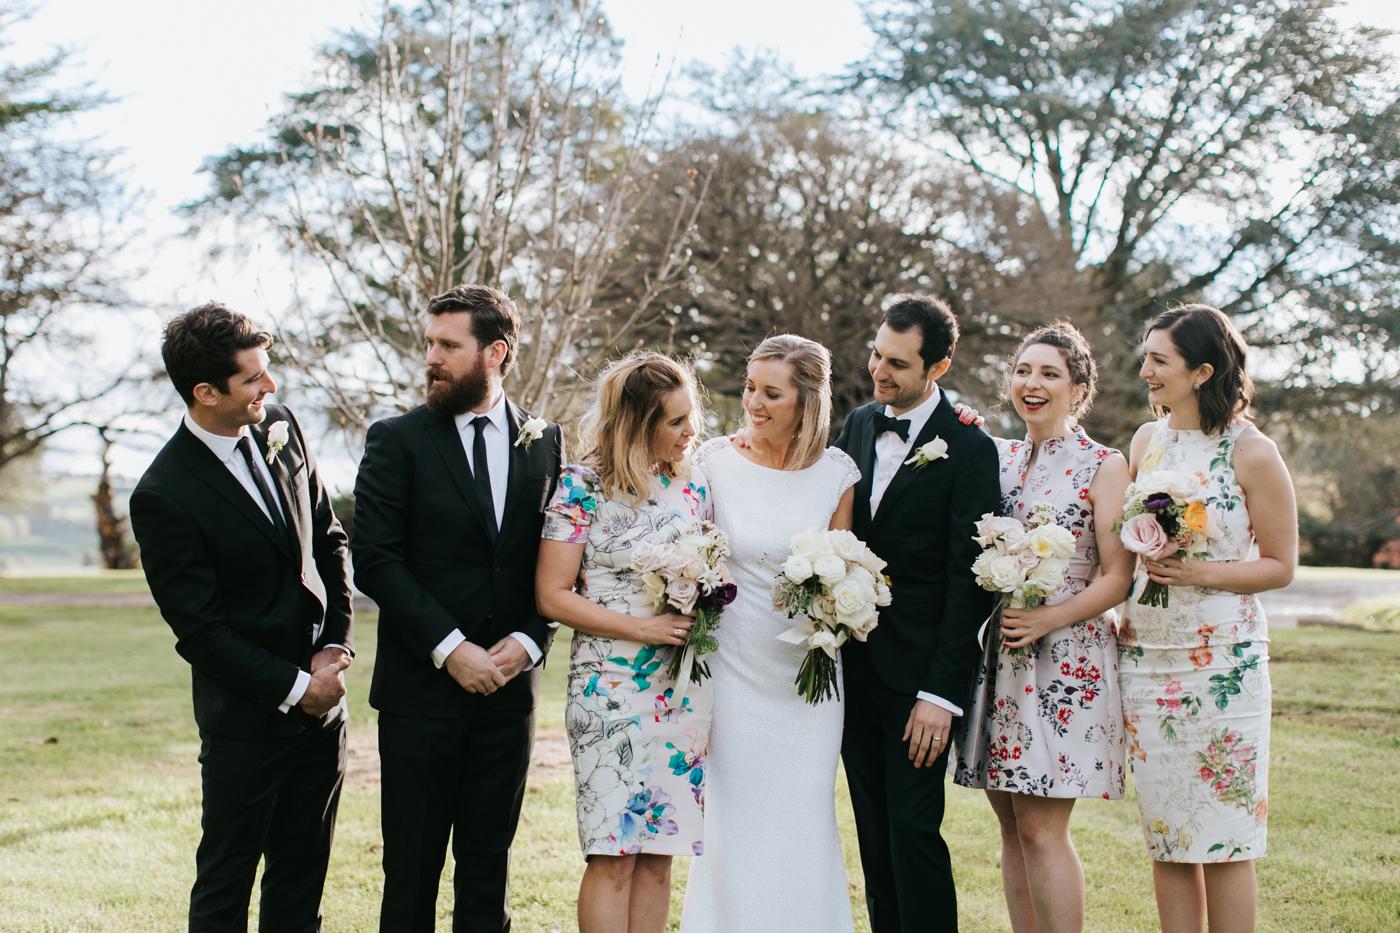 Bridget & James - Orange Country Wedding - Samantha Heather Photography-99.jpg